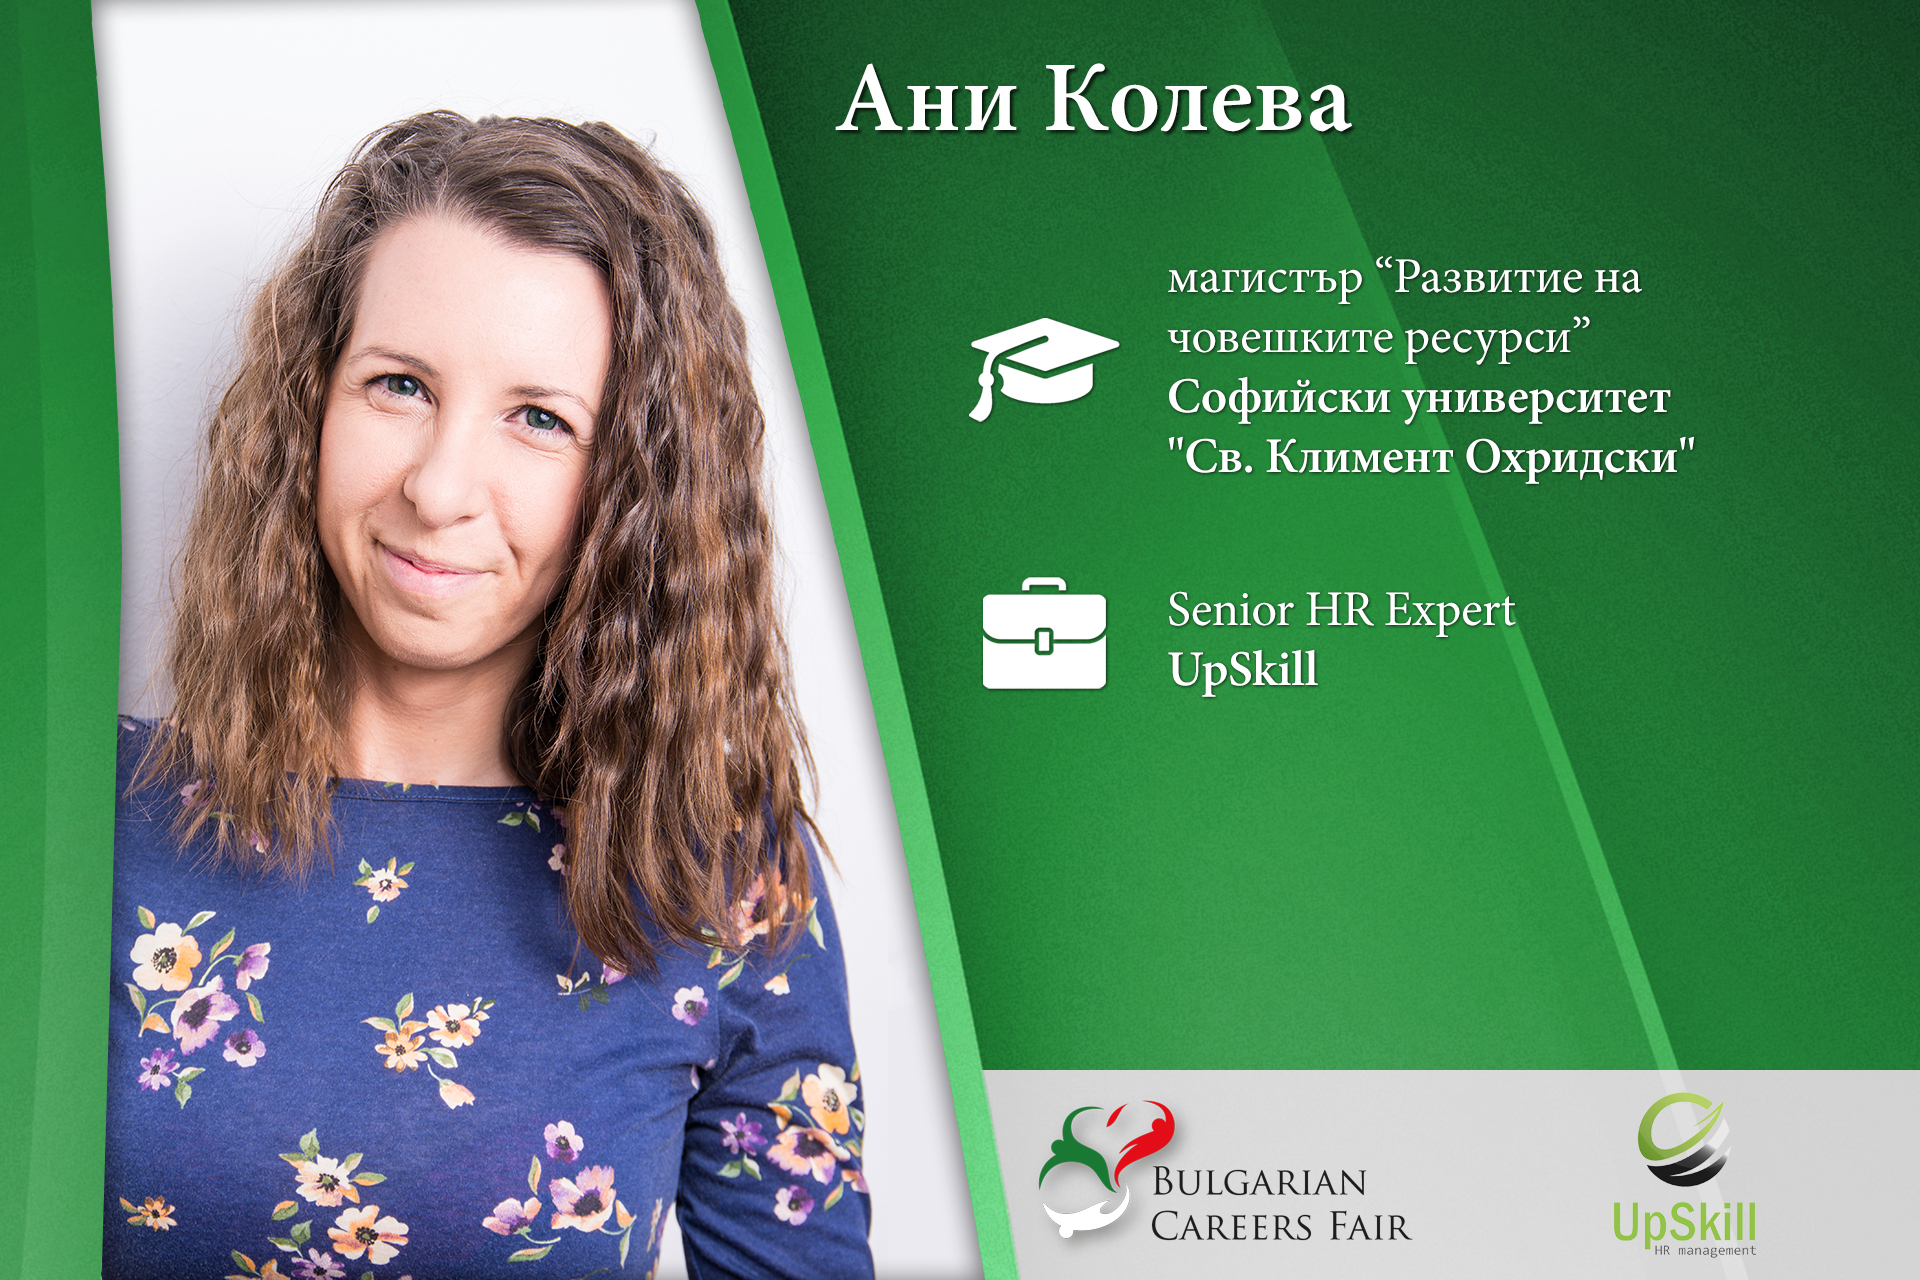 ani-koleva_profile